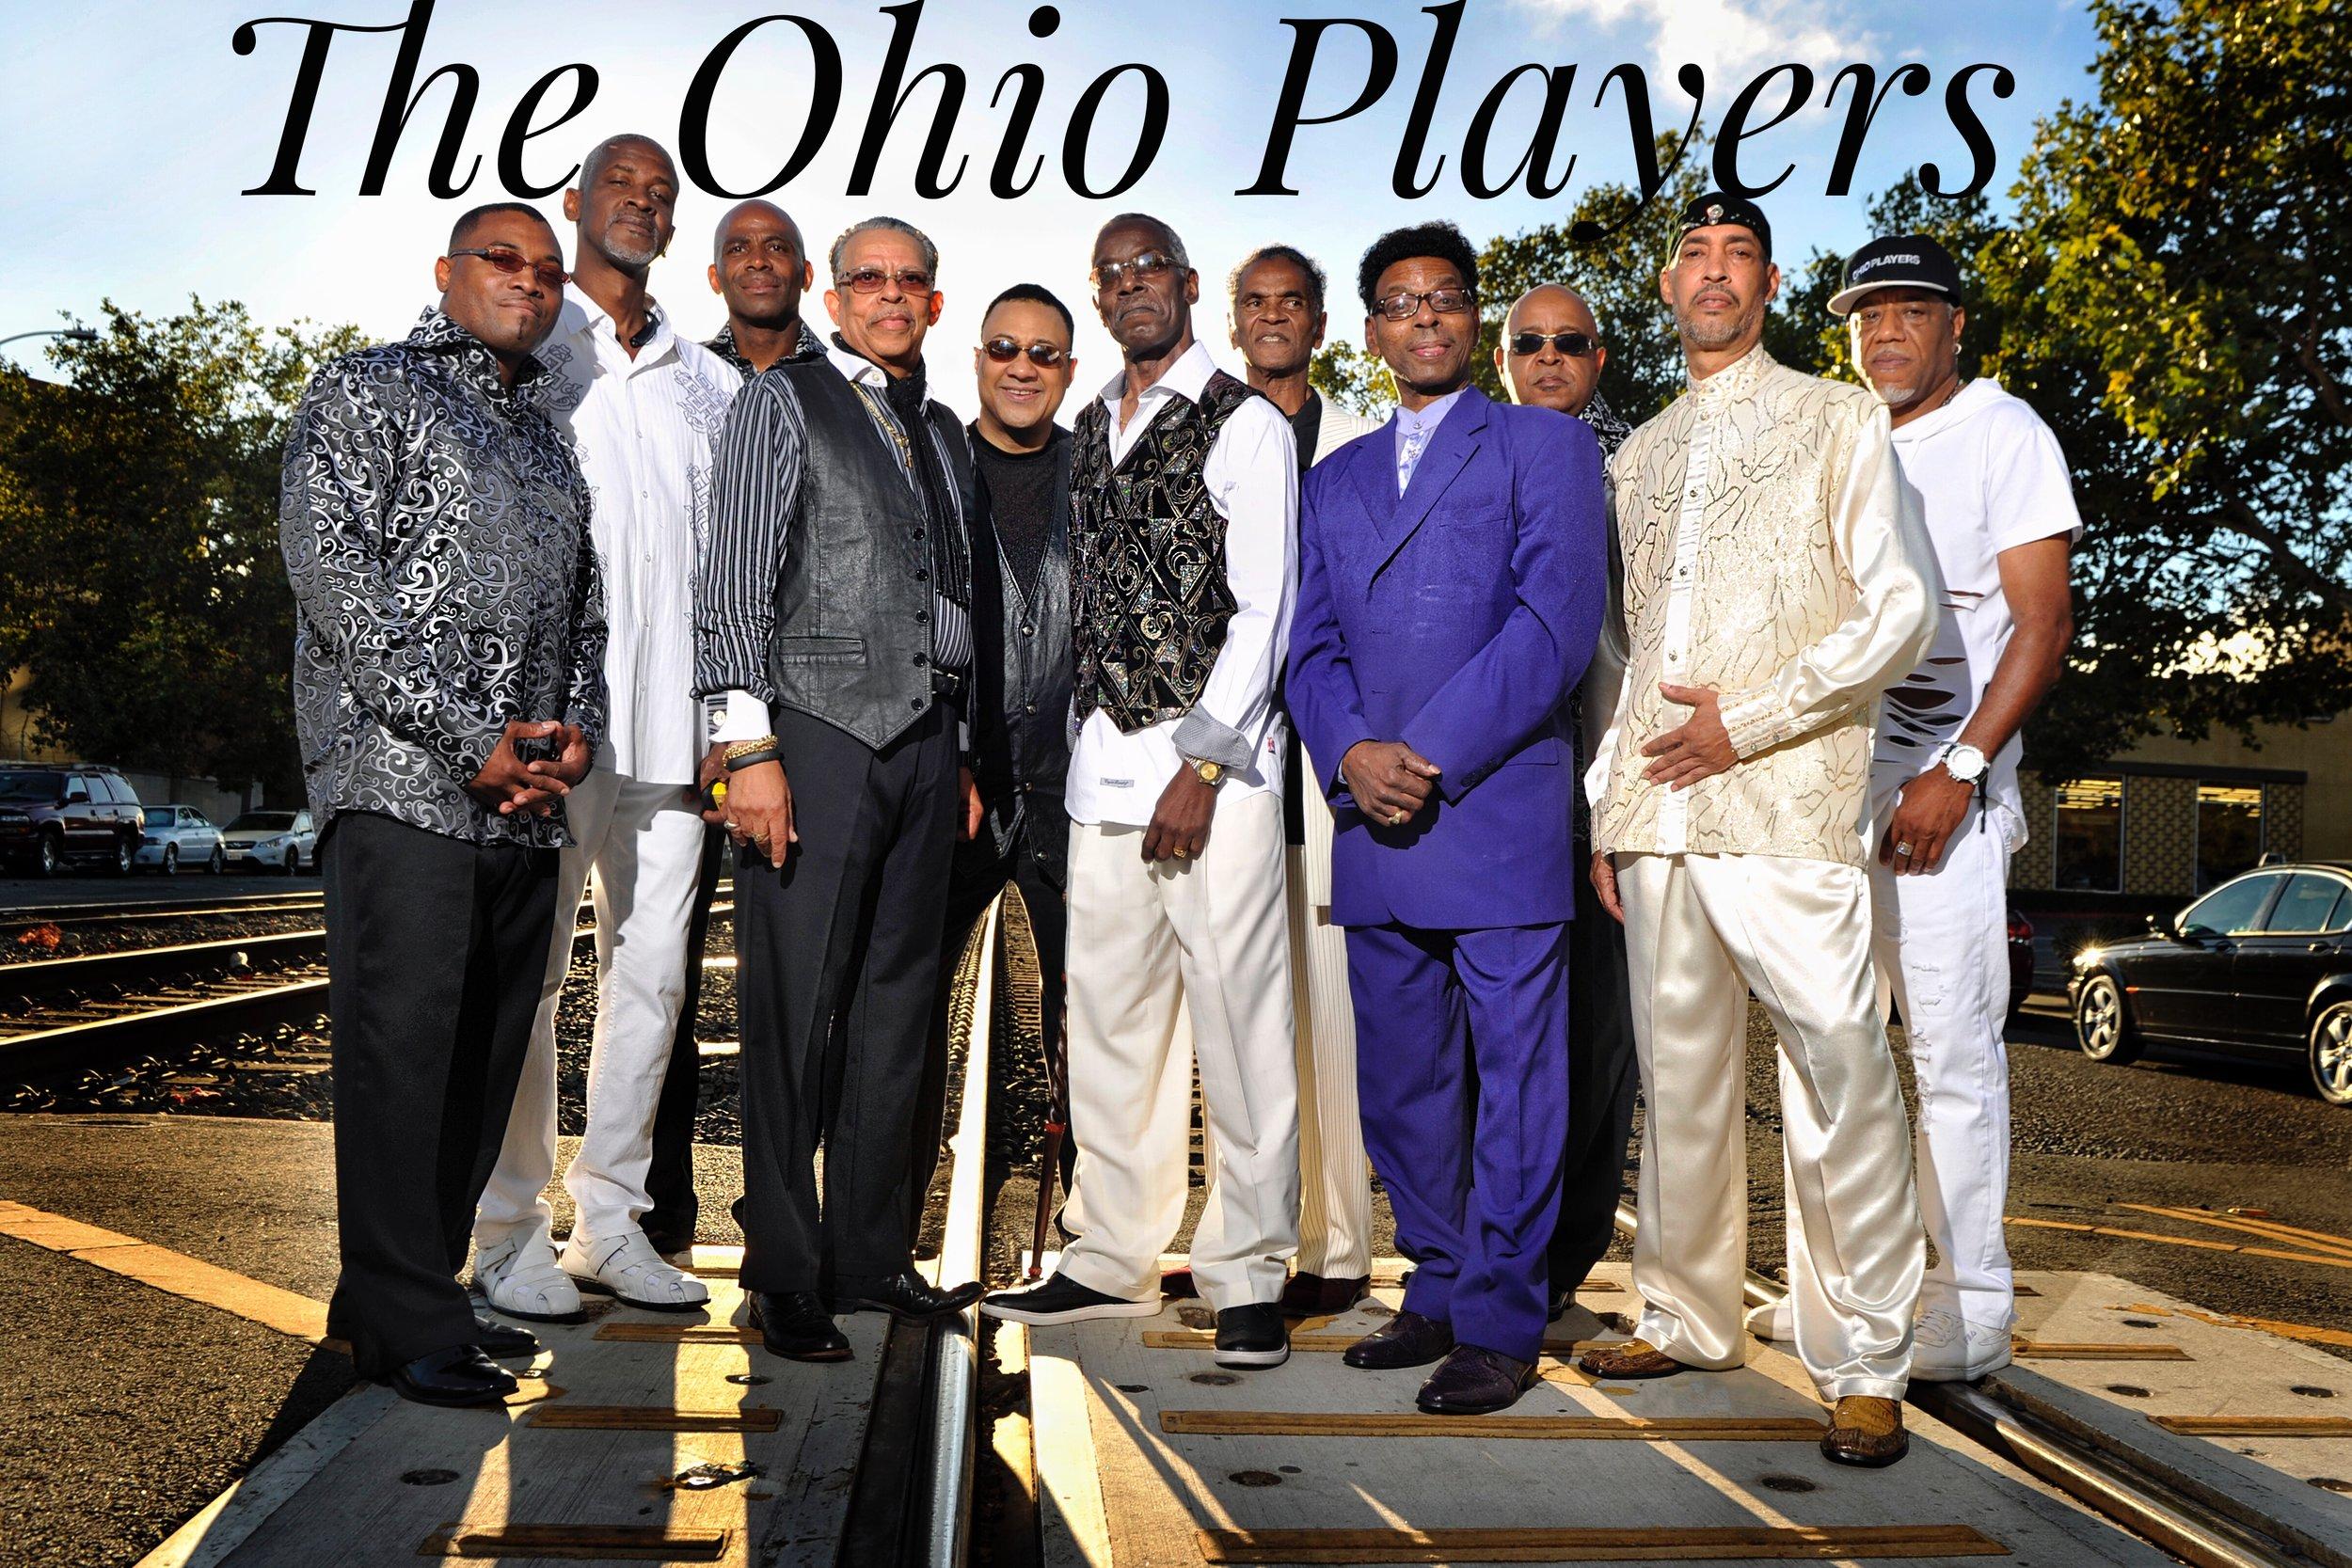 The Ohio Players.JPG